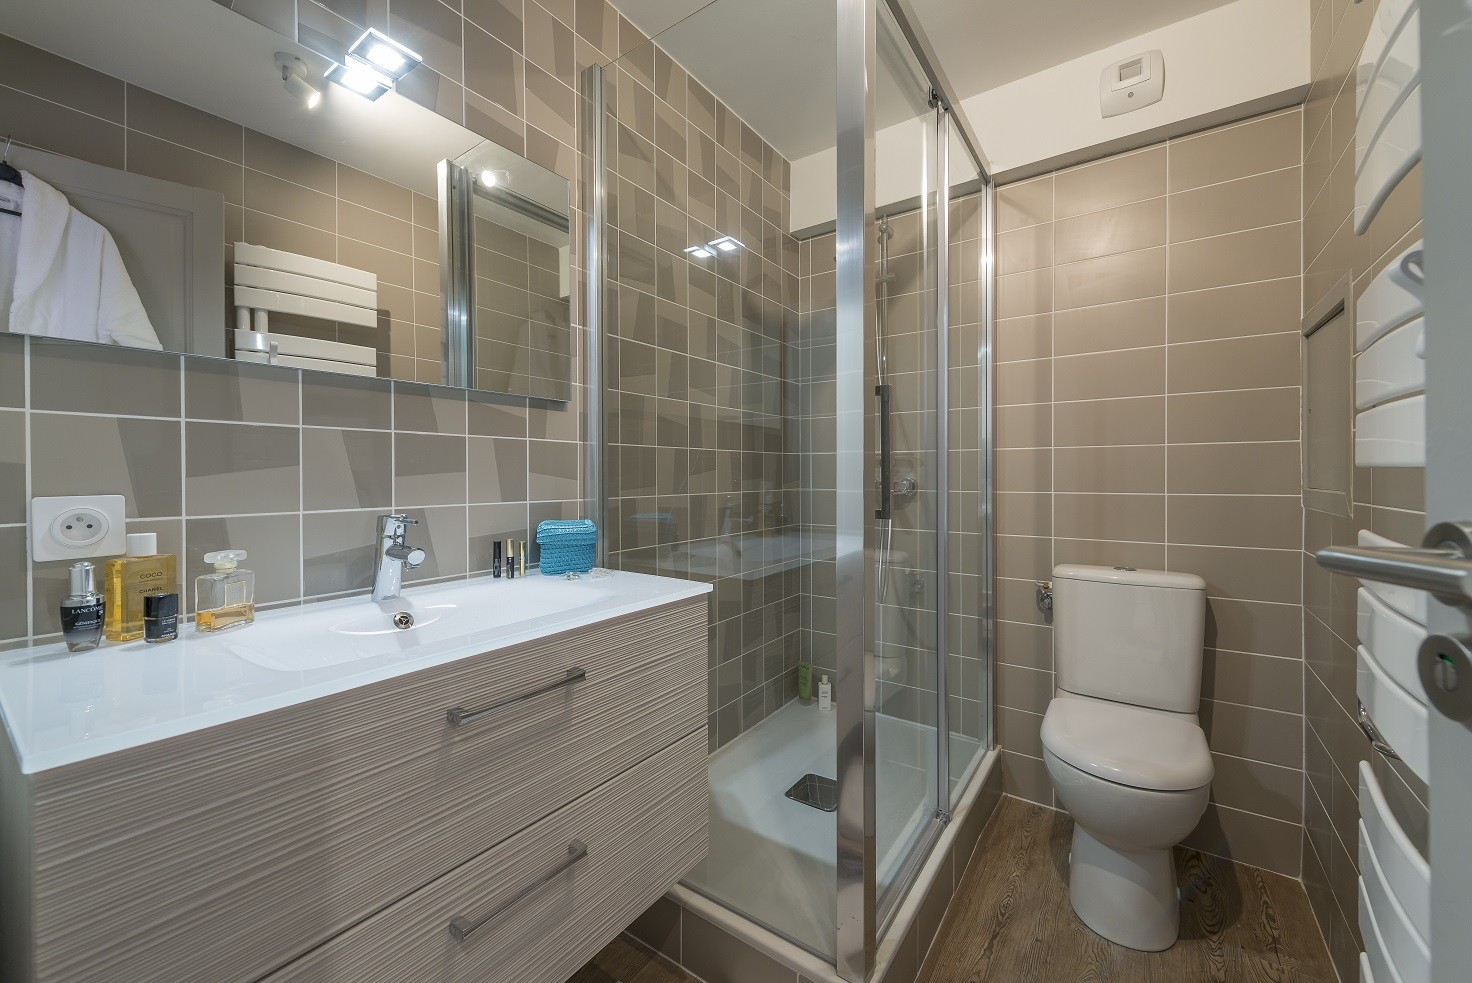 salle-de-bain-1472x983-7721